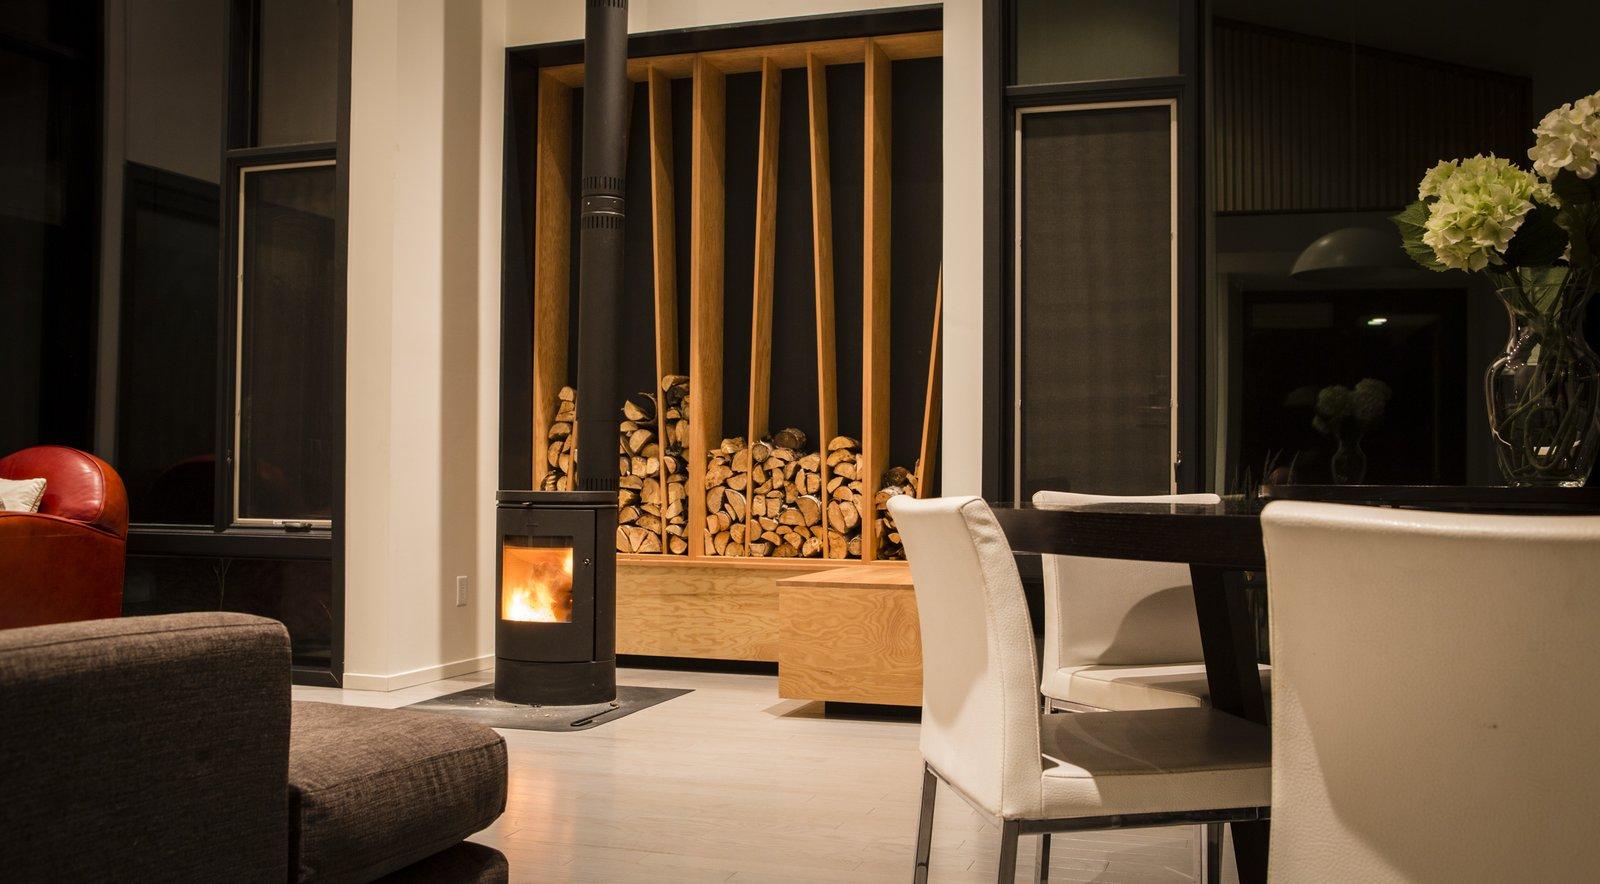 Living Room, Chair, Sectional, Ceiling Lighting, Medium Hardwood Floor, and Wood Burning Fireplace  Pioneer Cabin